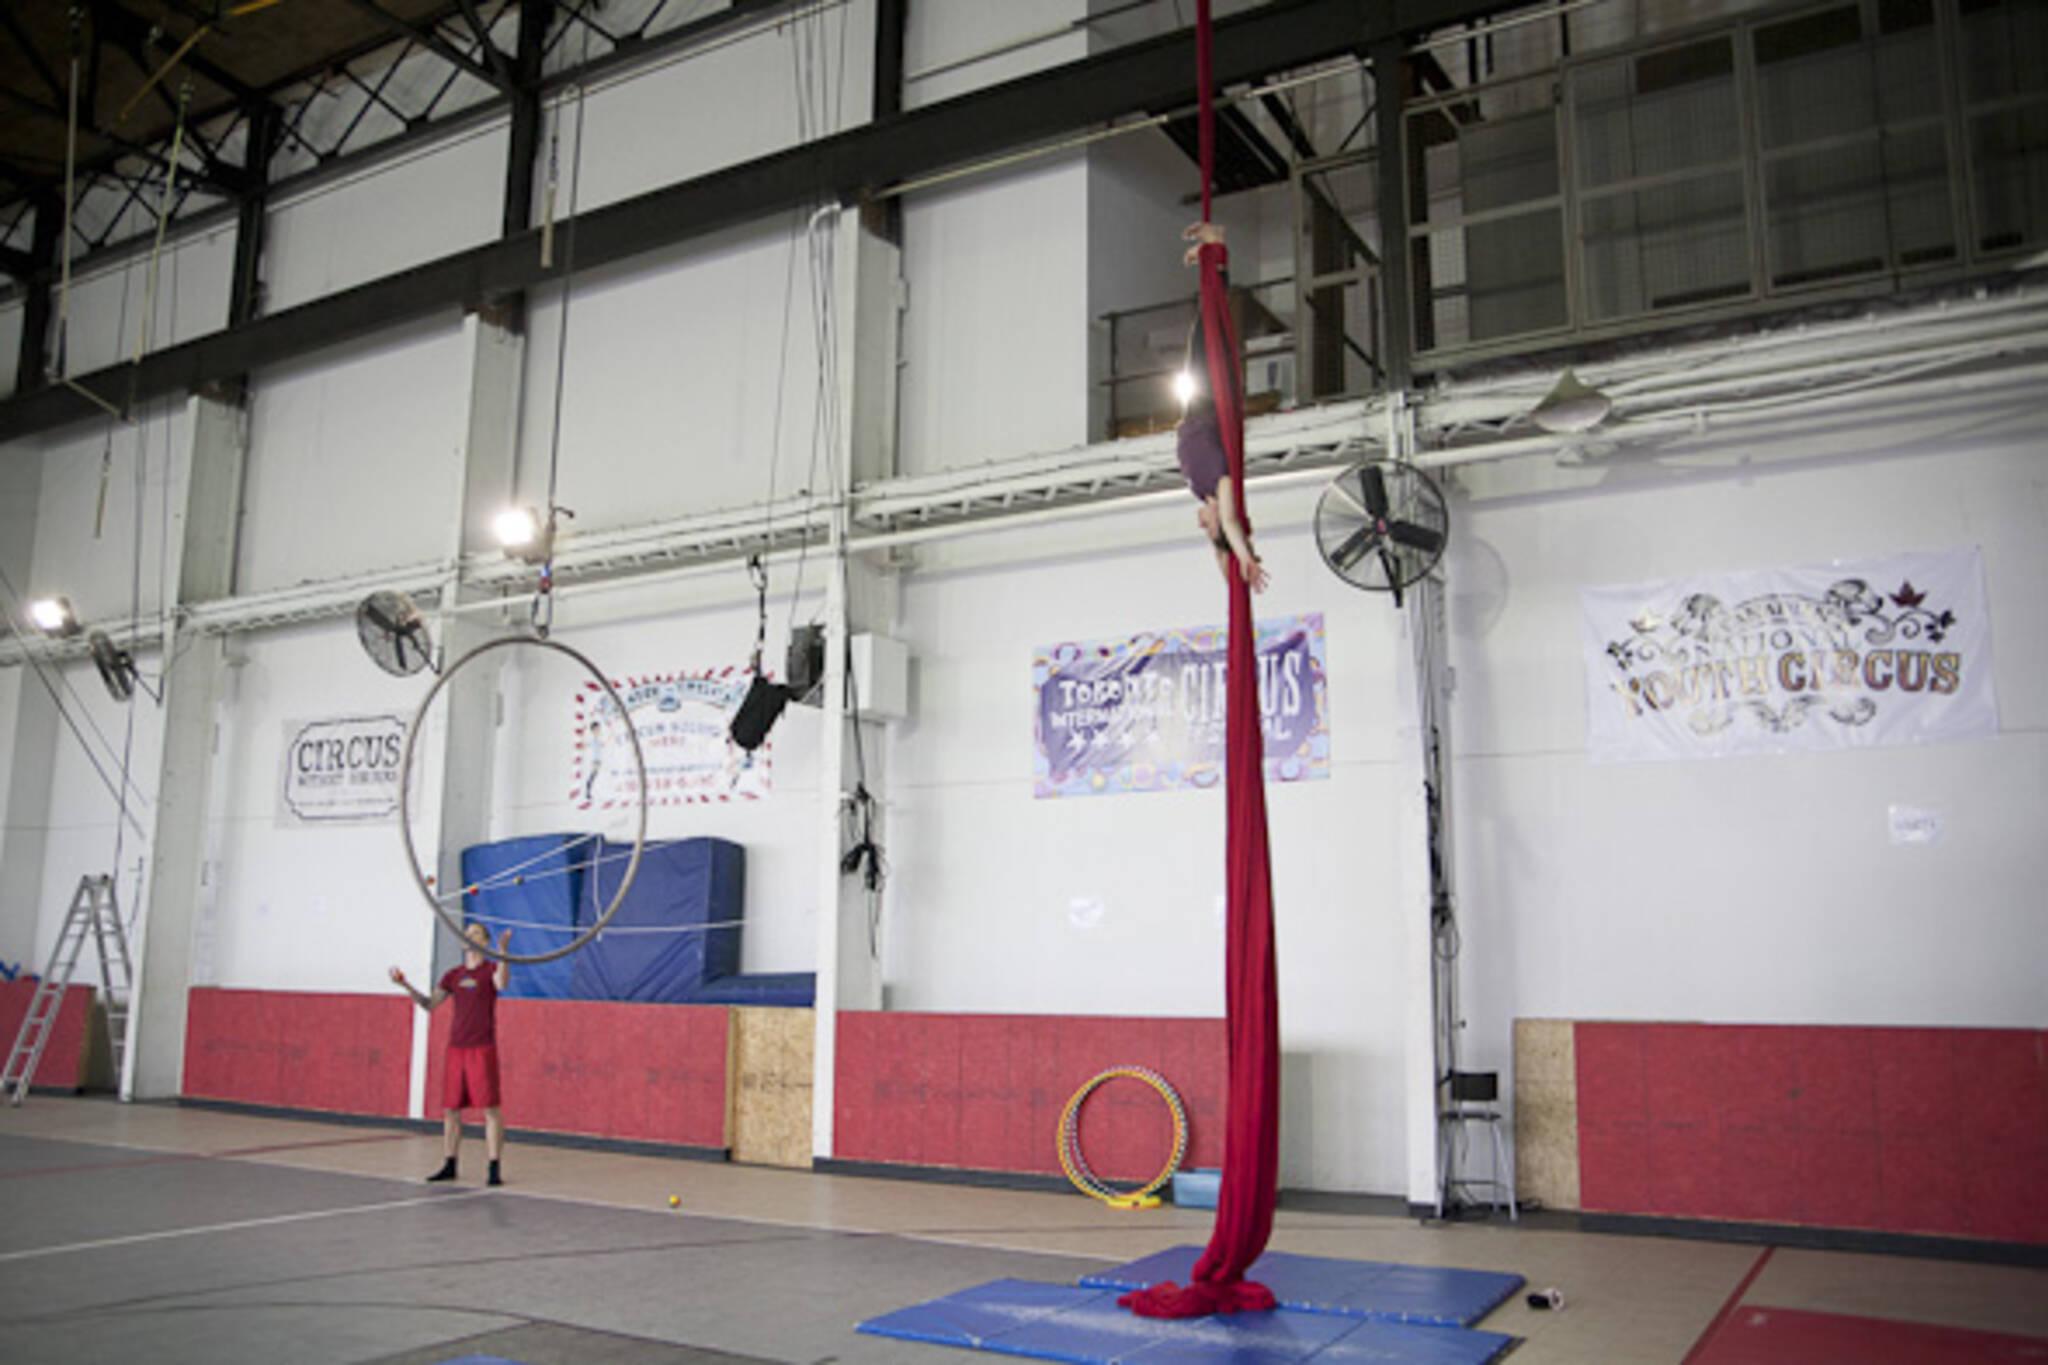 Circus School Toronto